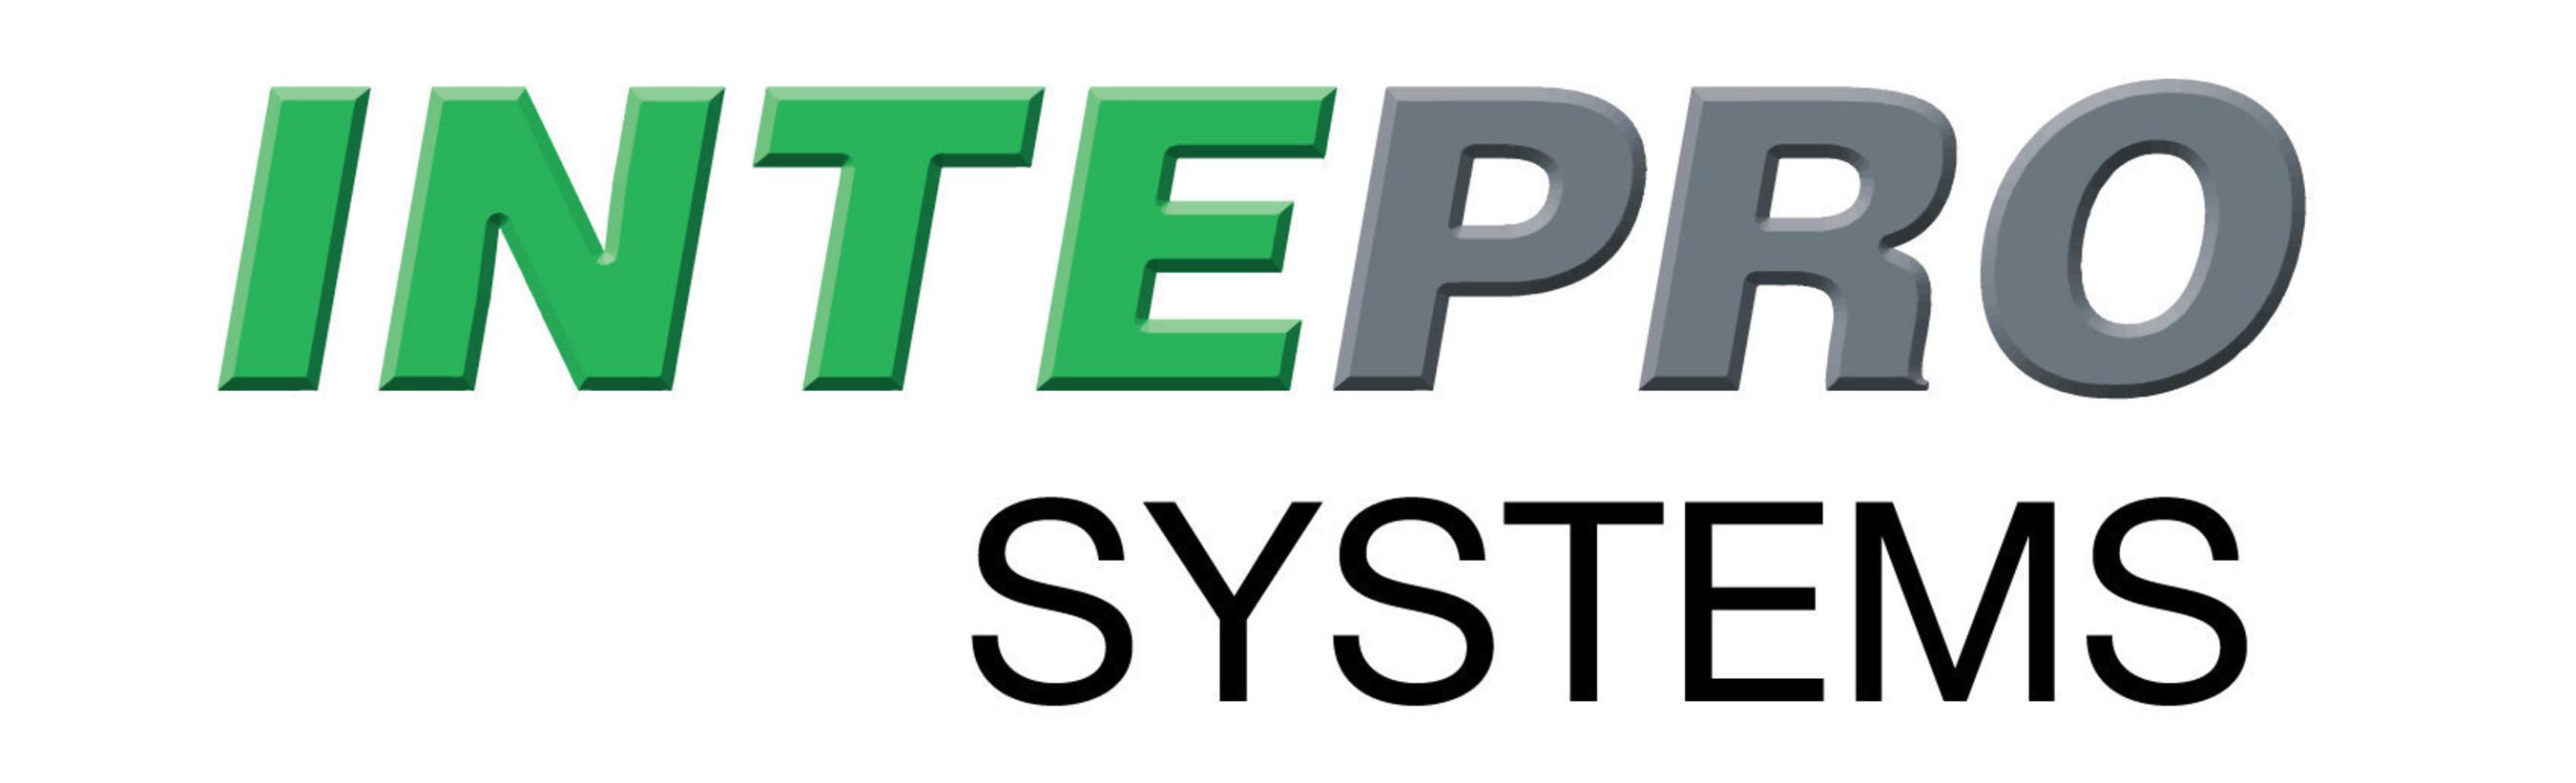 Intepro Systems logo